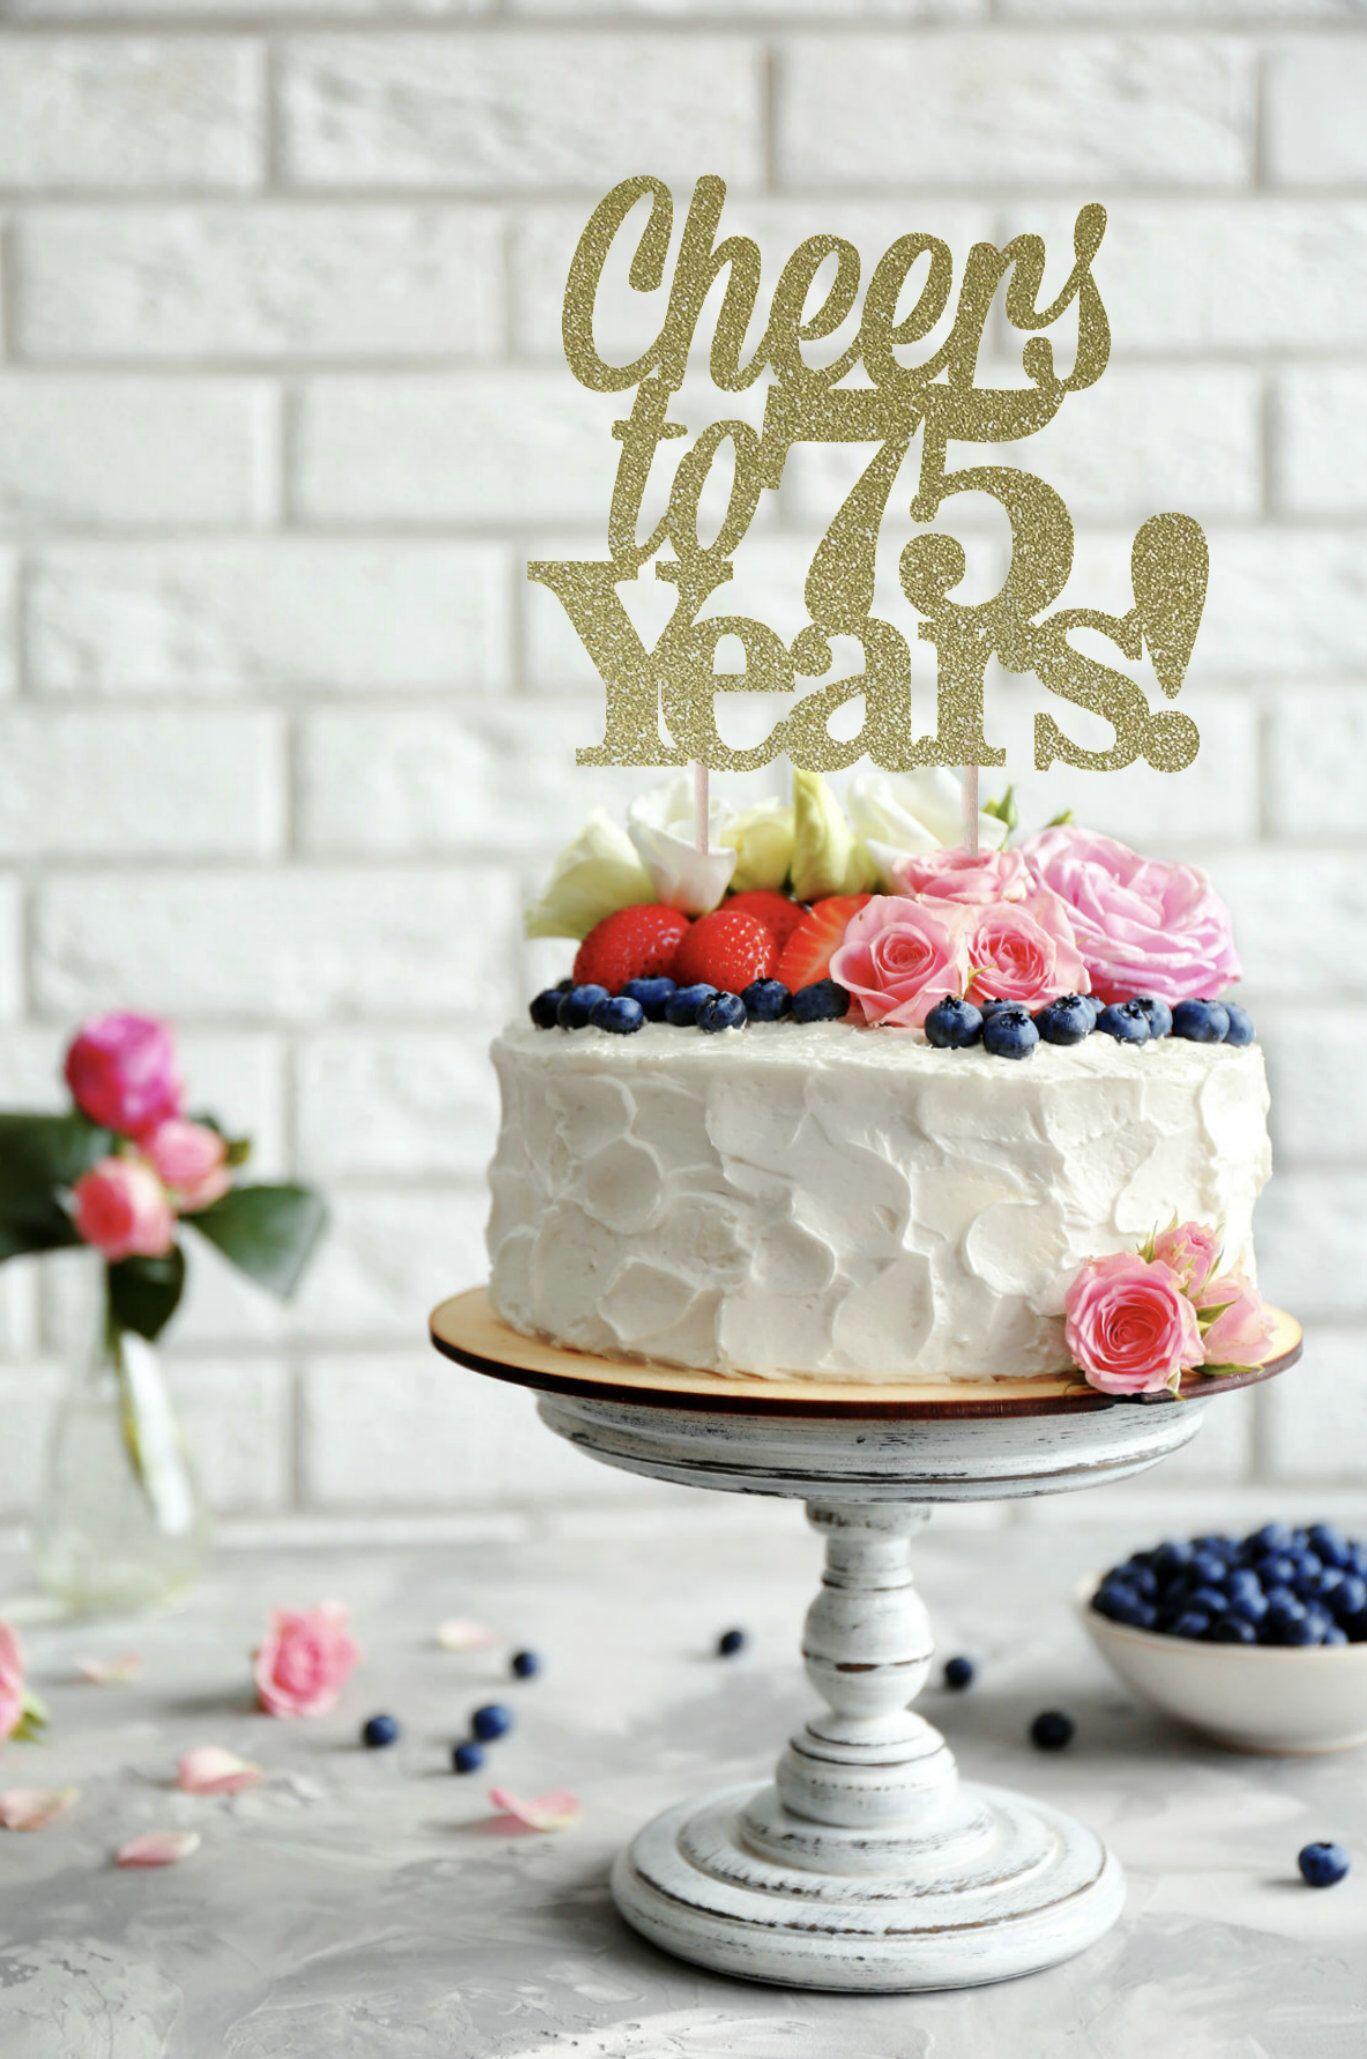 Cake Topper 75th Birthday Happy Anniversary 75 Years Loved